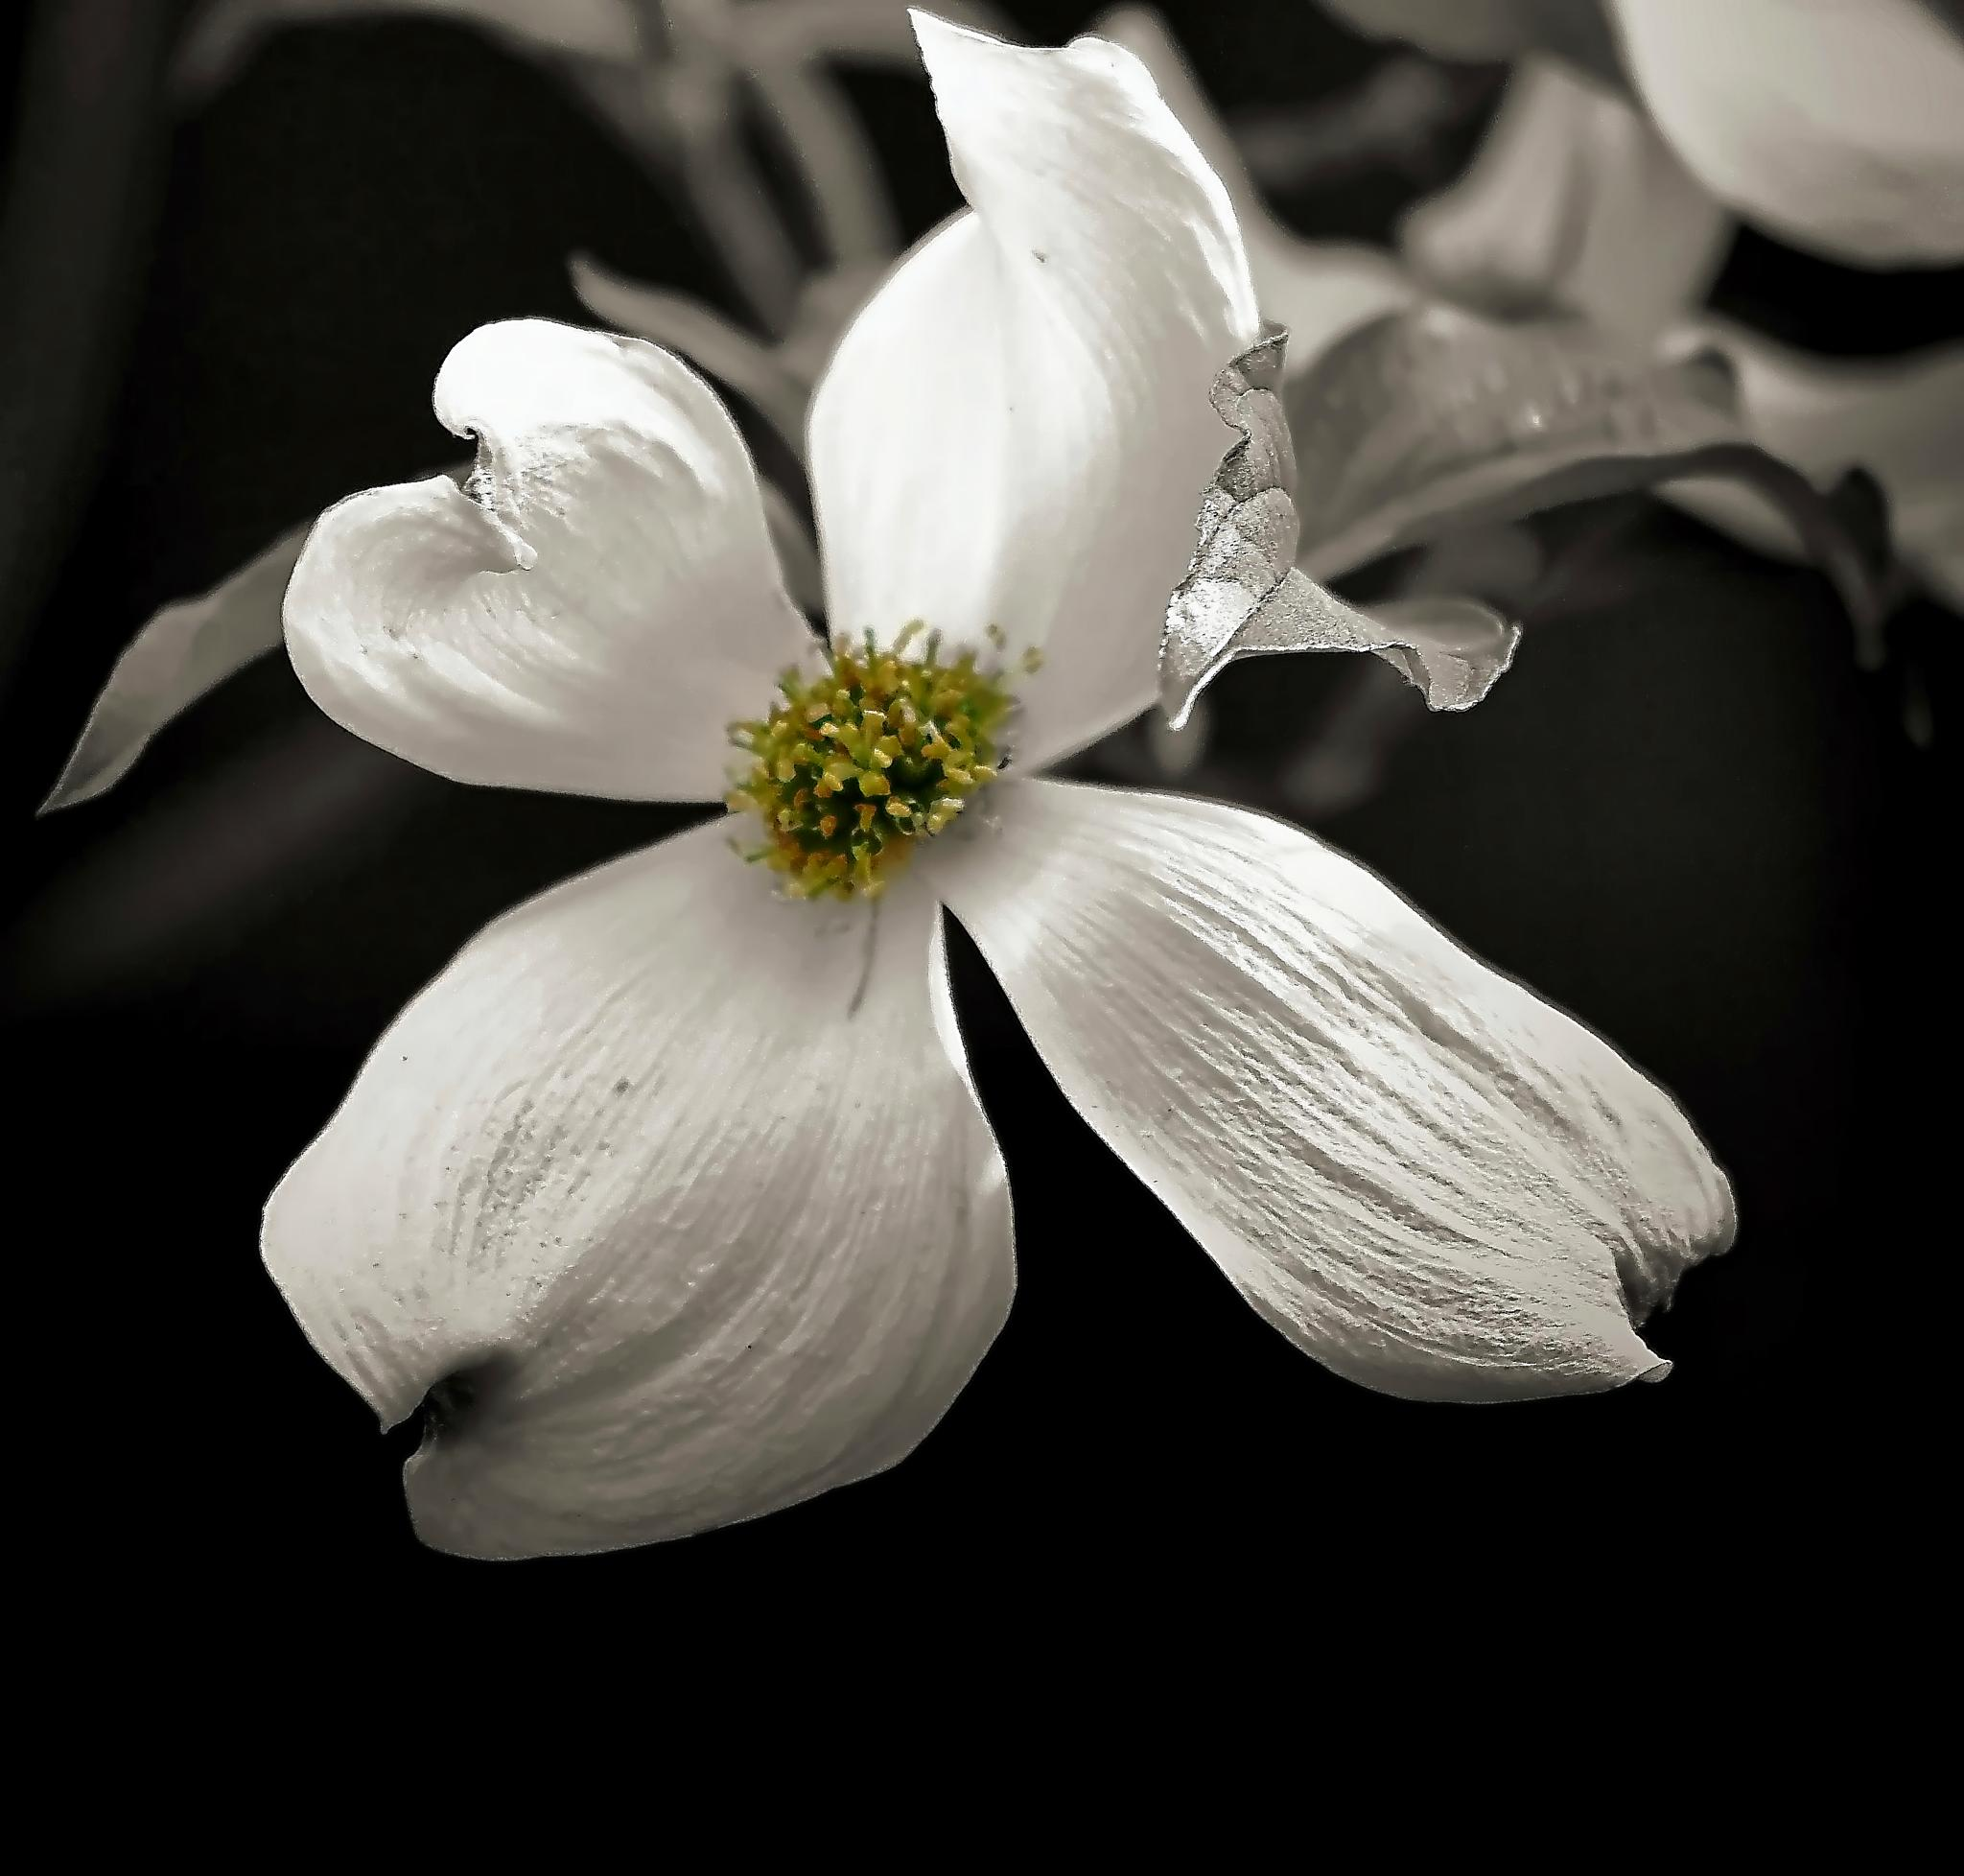 Dogwood Blossom by darlenehoneycutt